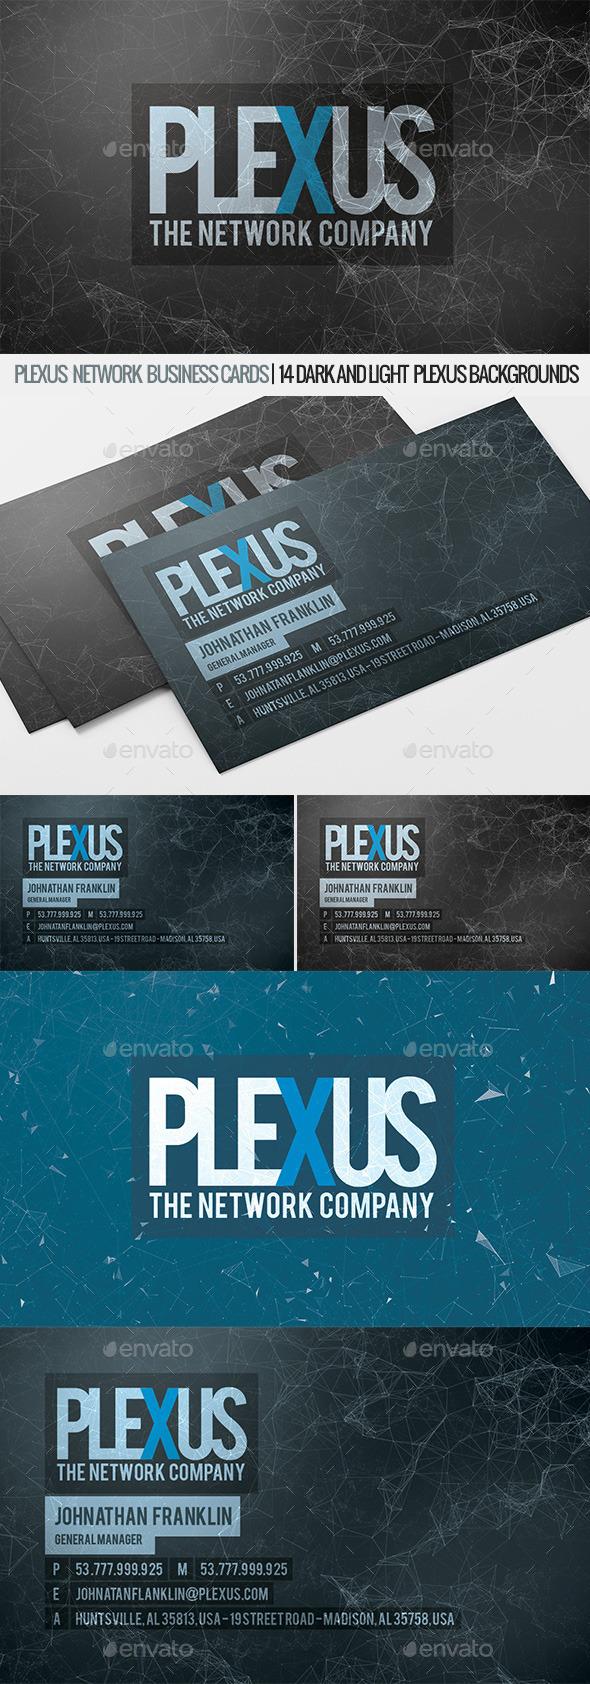 Plexus business cards by designsomething graphicriver plexus business cards corporate business cards colourmoves